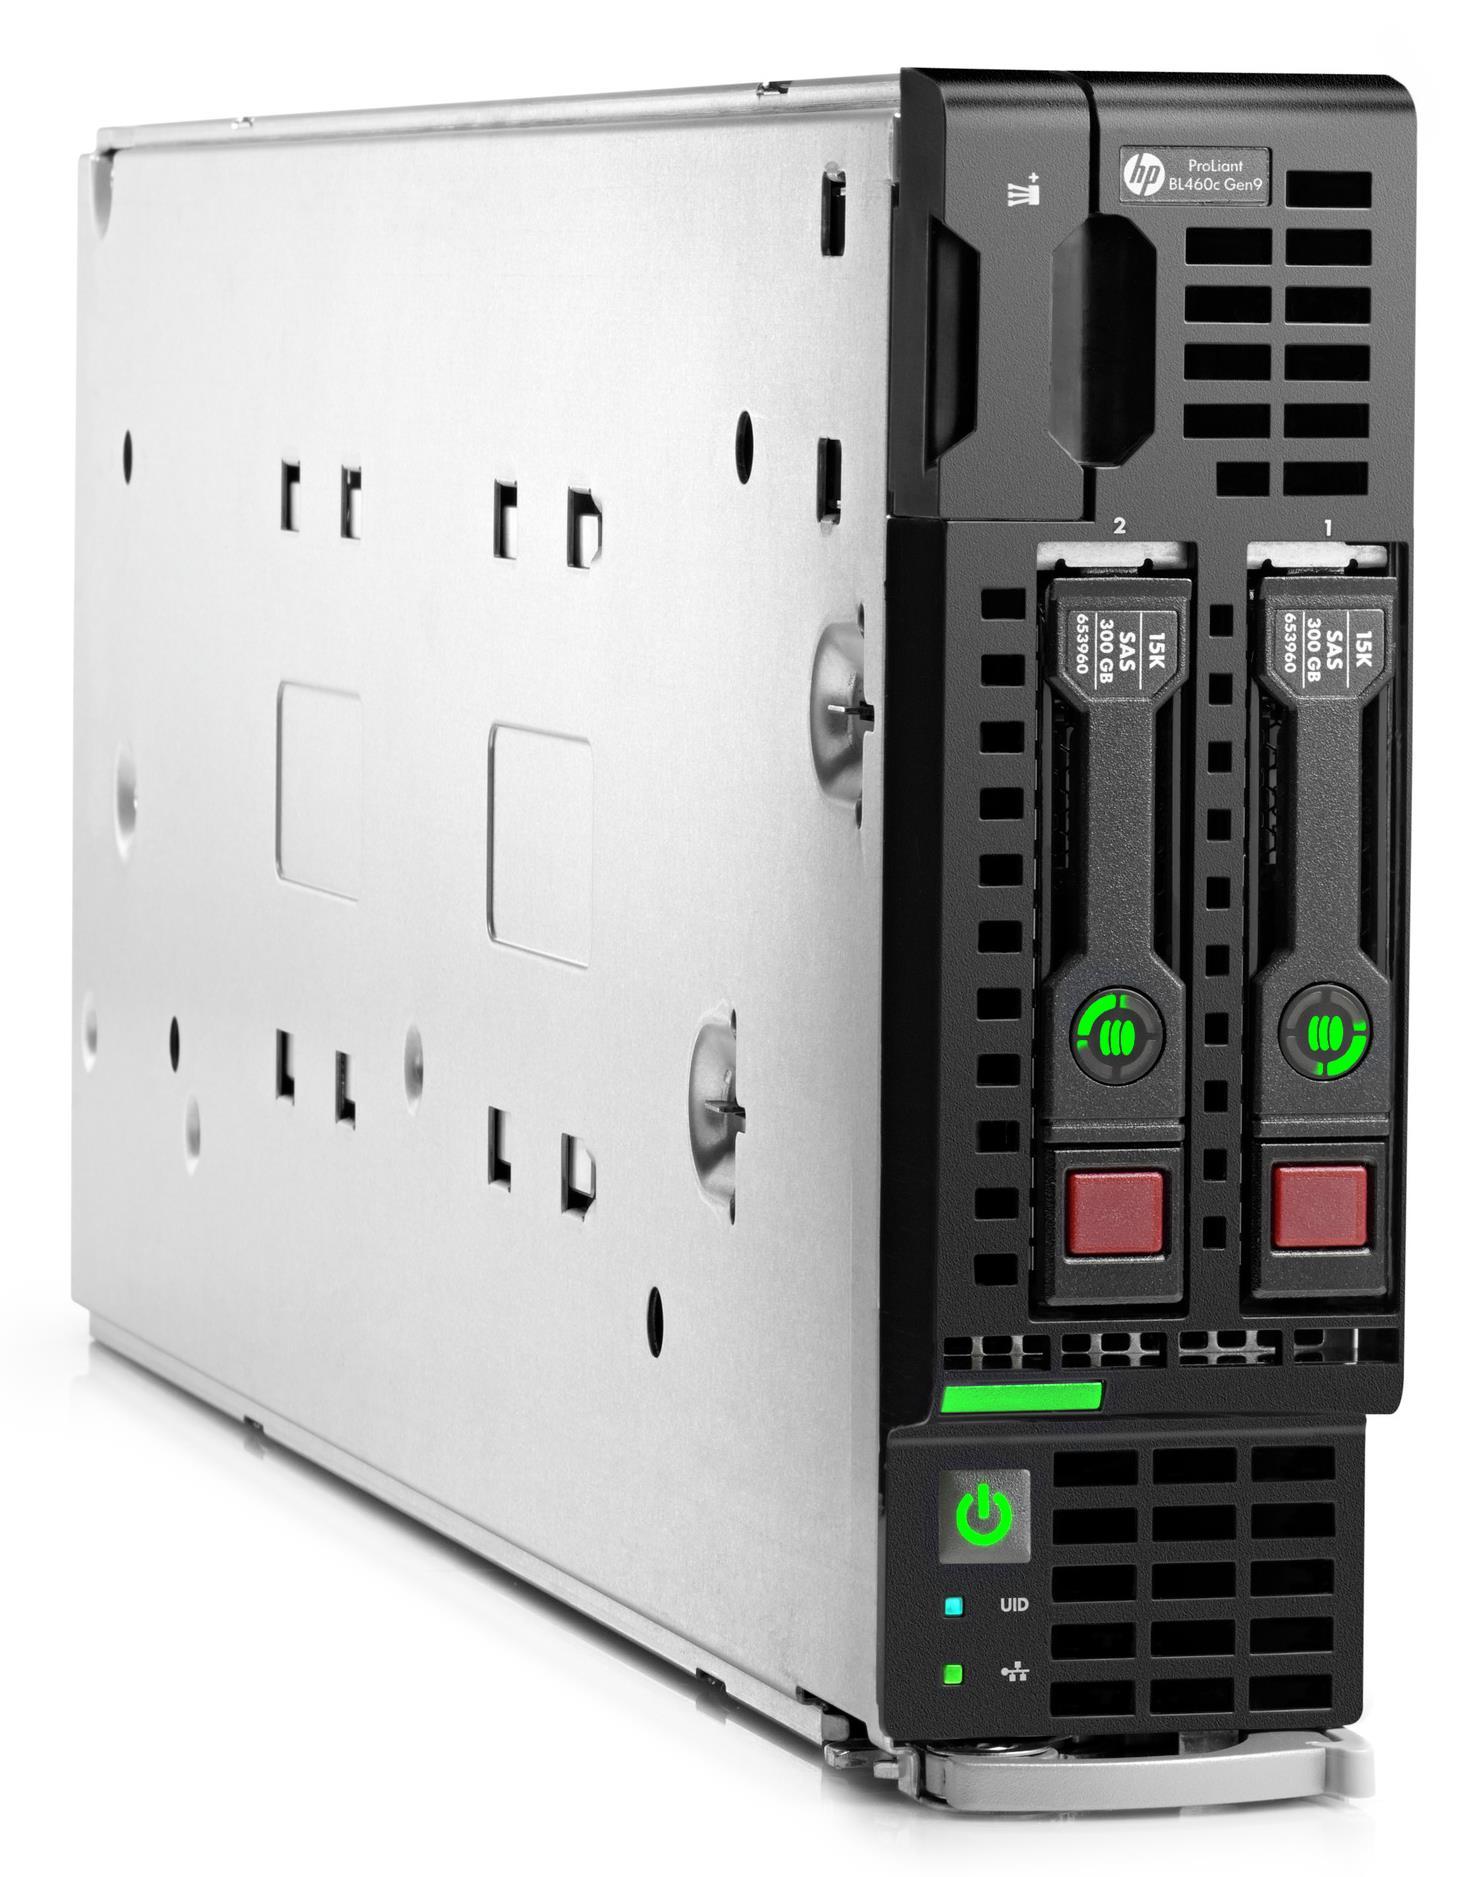 HP ProLiant BL460c Gen9 Blade Server/TV (1P) Xeon E5 (2620 v3) 2.4GHz 32GB-R (no HDD) SFF (Matrox G200eh 256MB)